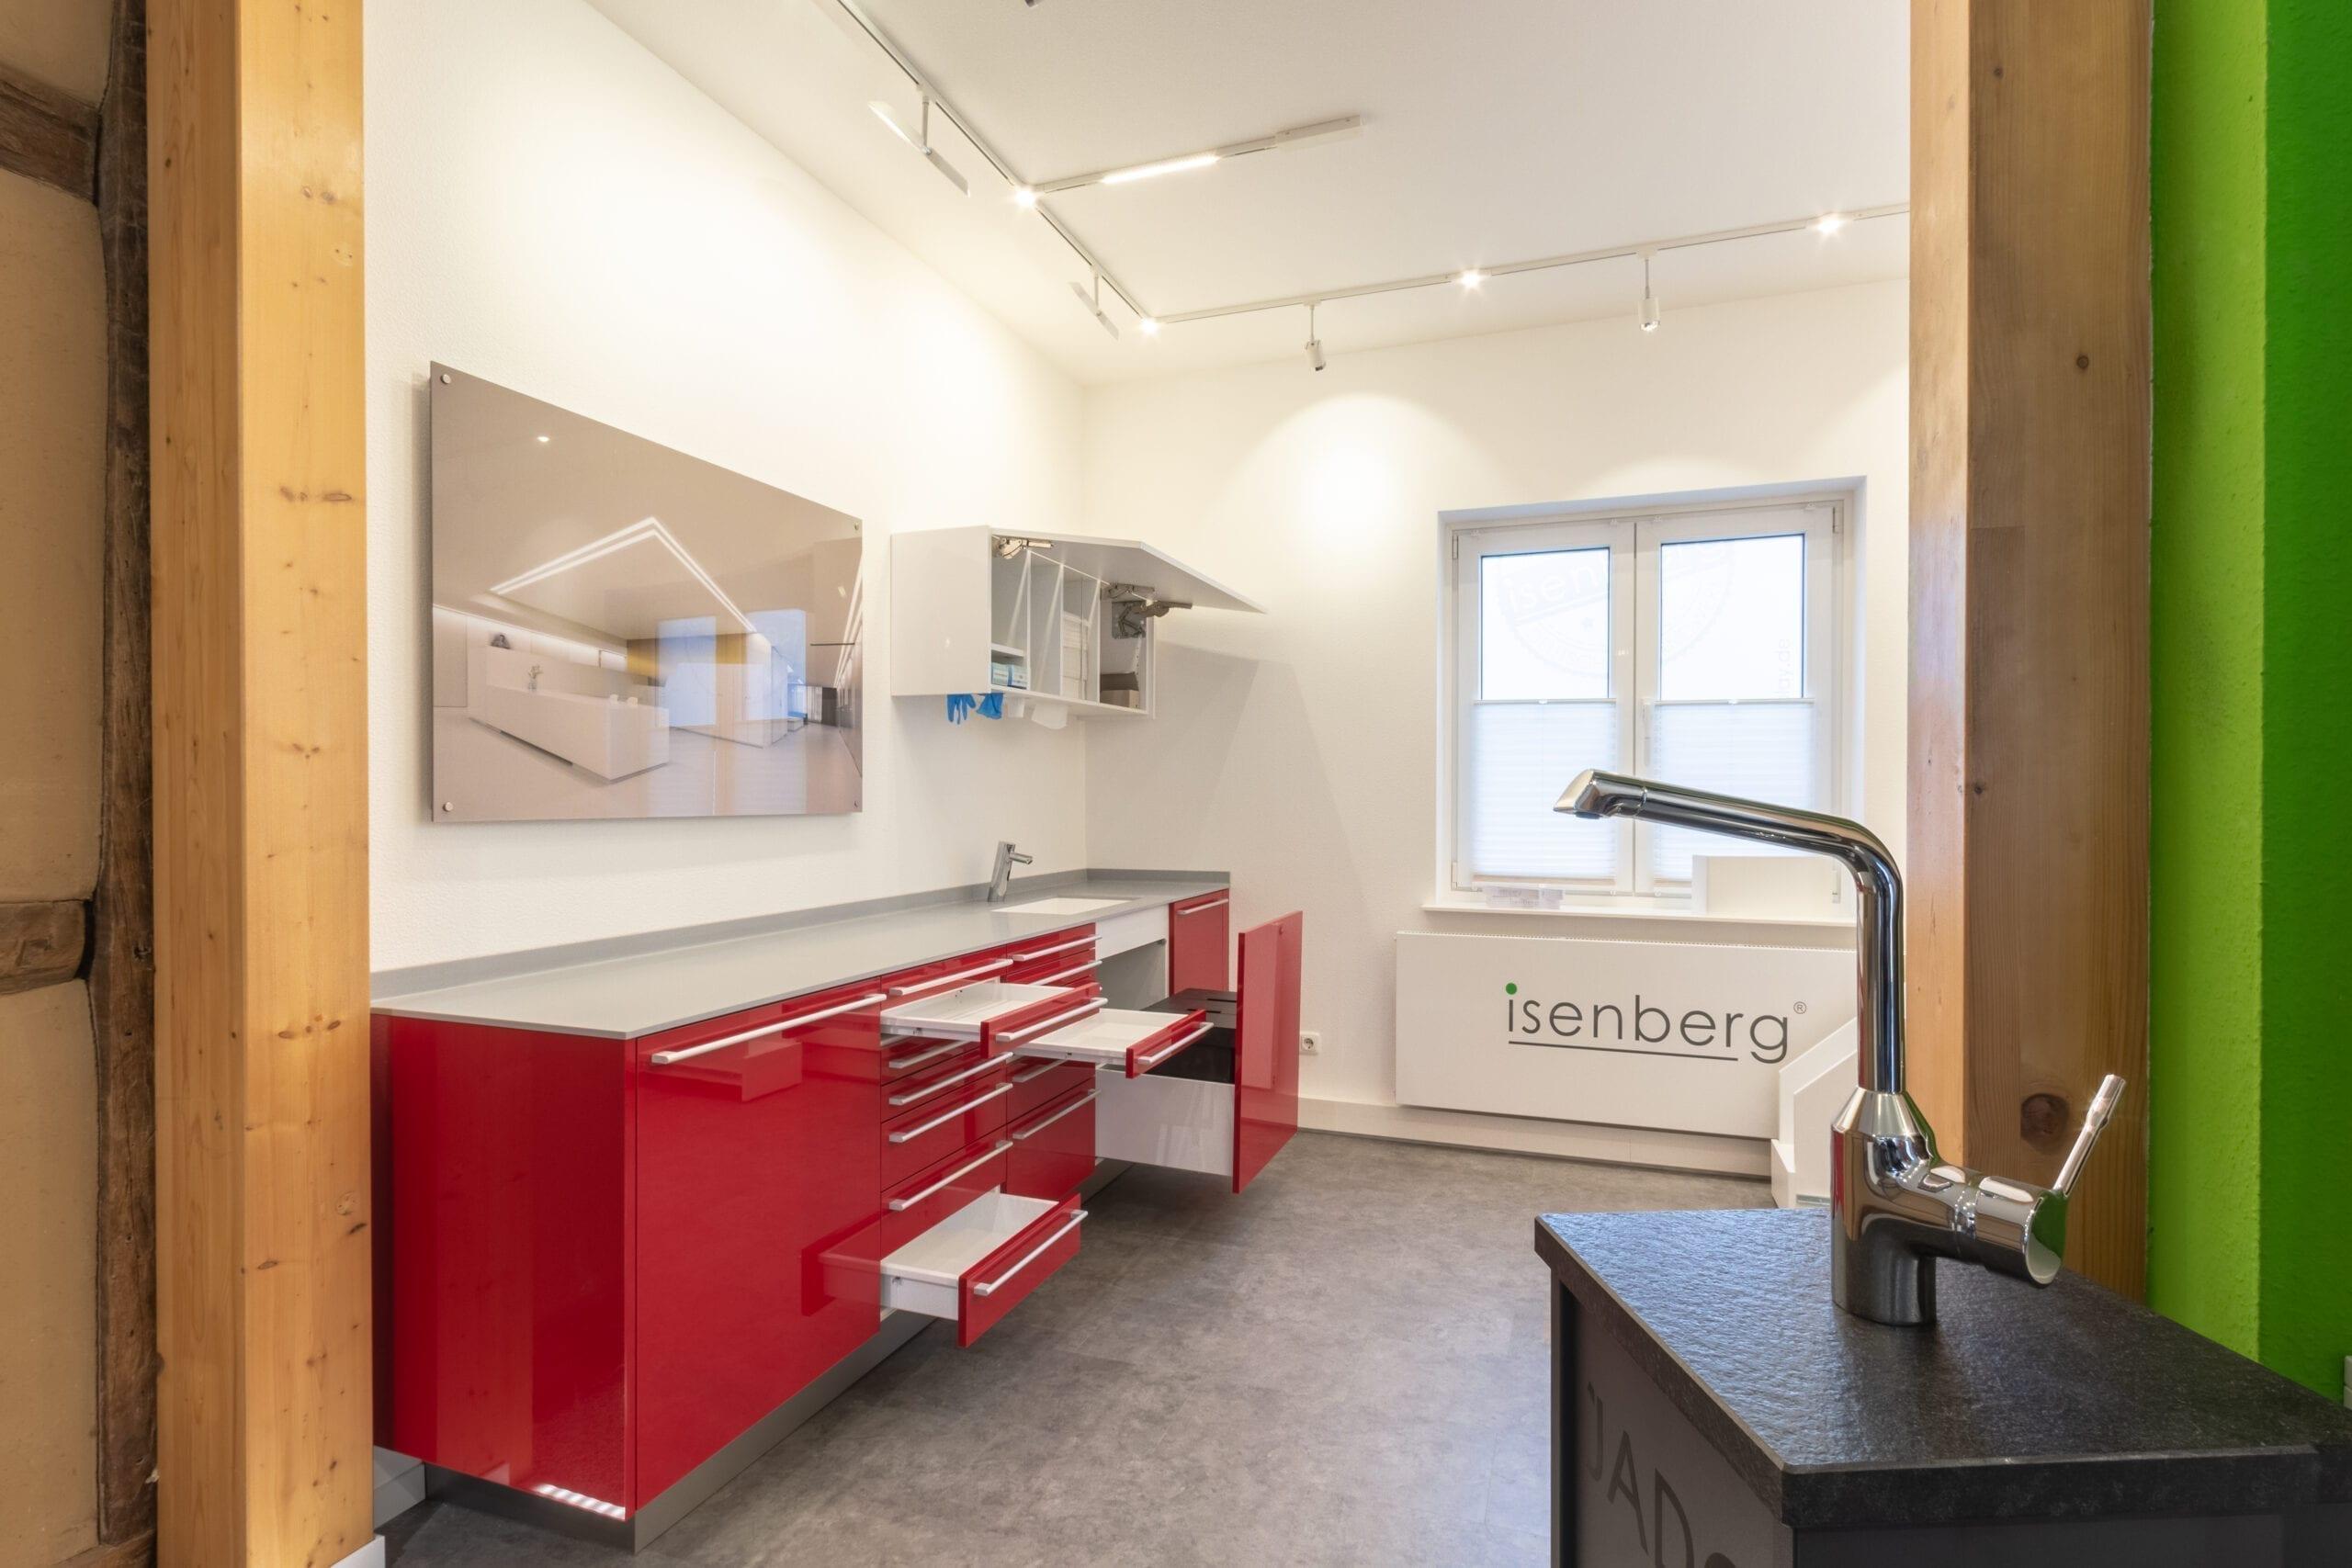 isenberg Showroom 3